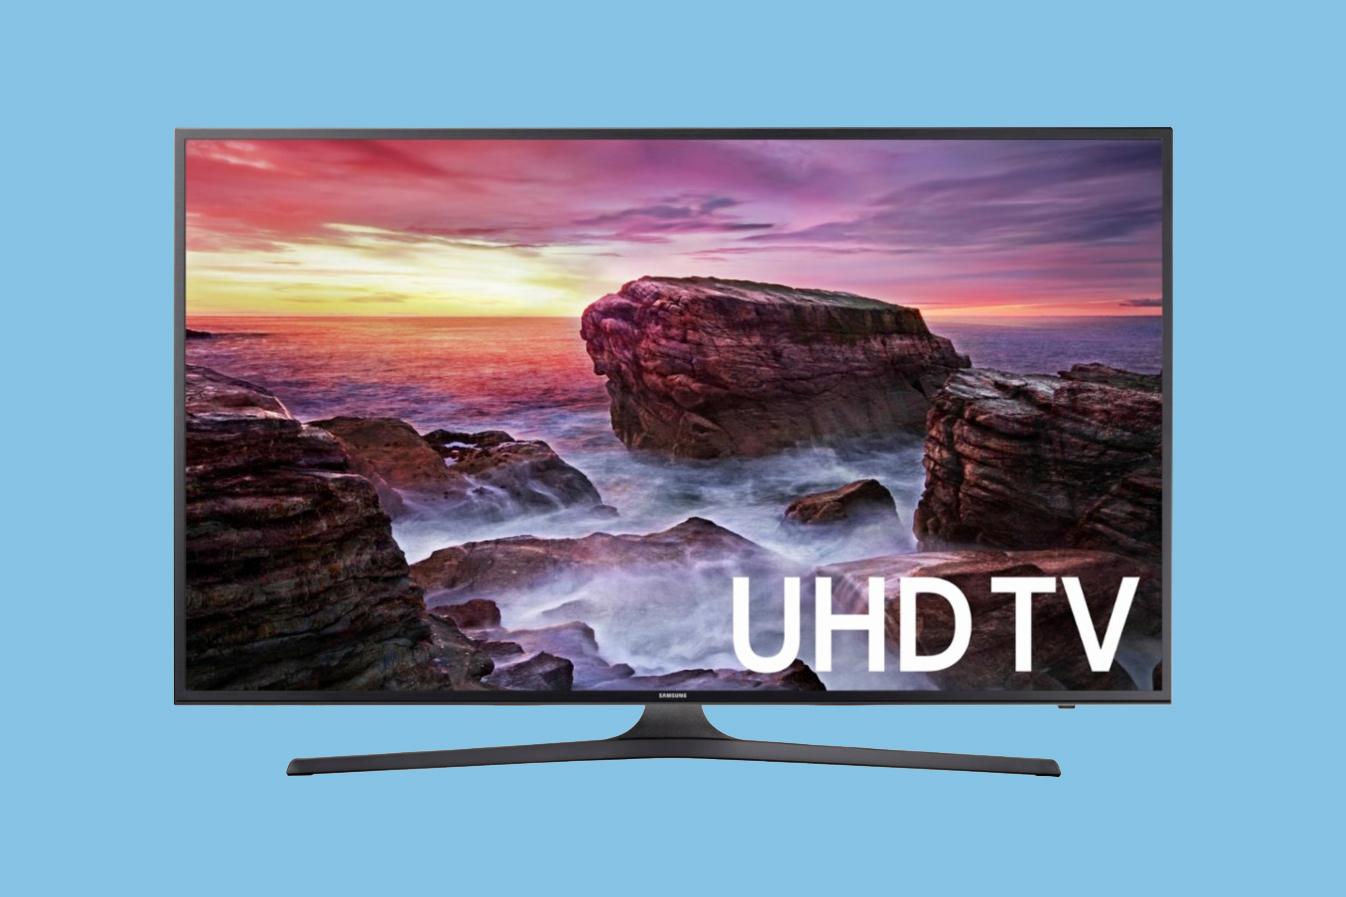 171121-black-friday-deals-2017-tvs